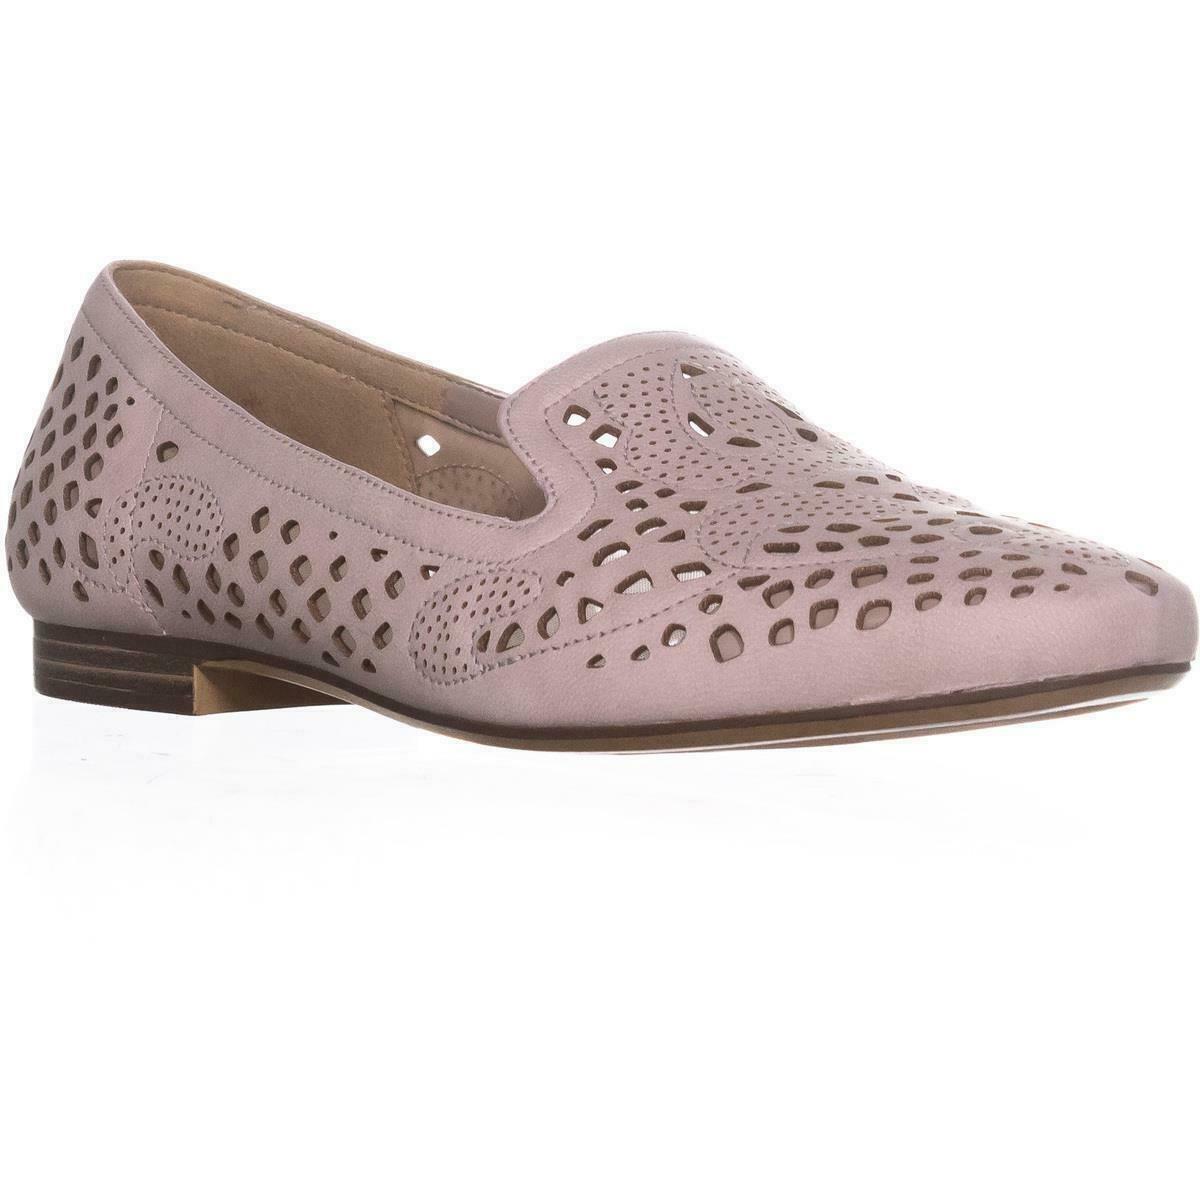 fddf4ff09f8 naturalizer Eve Cutout Square Toe Loafers